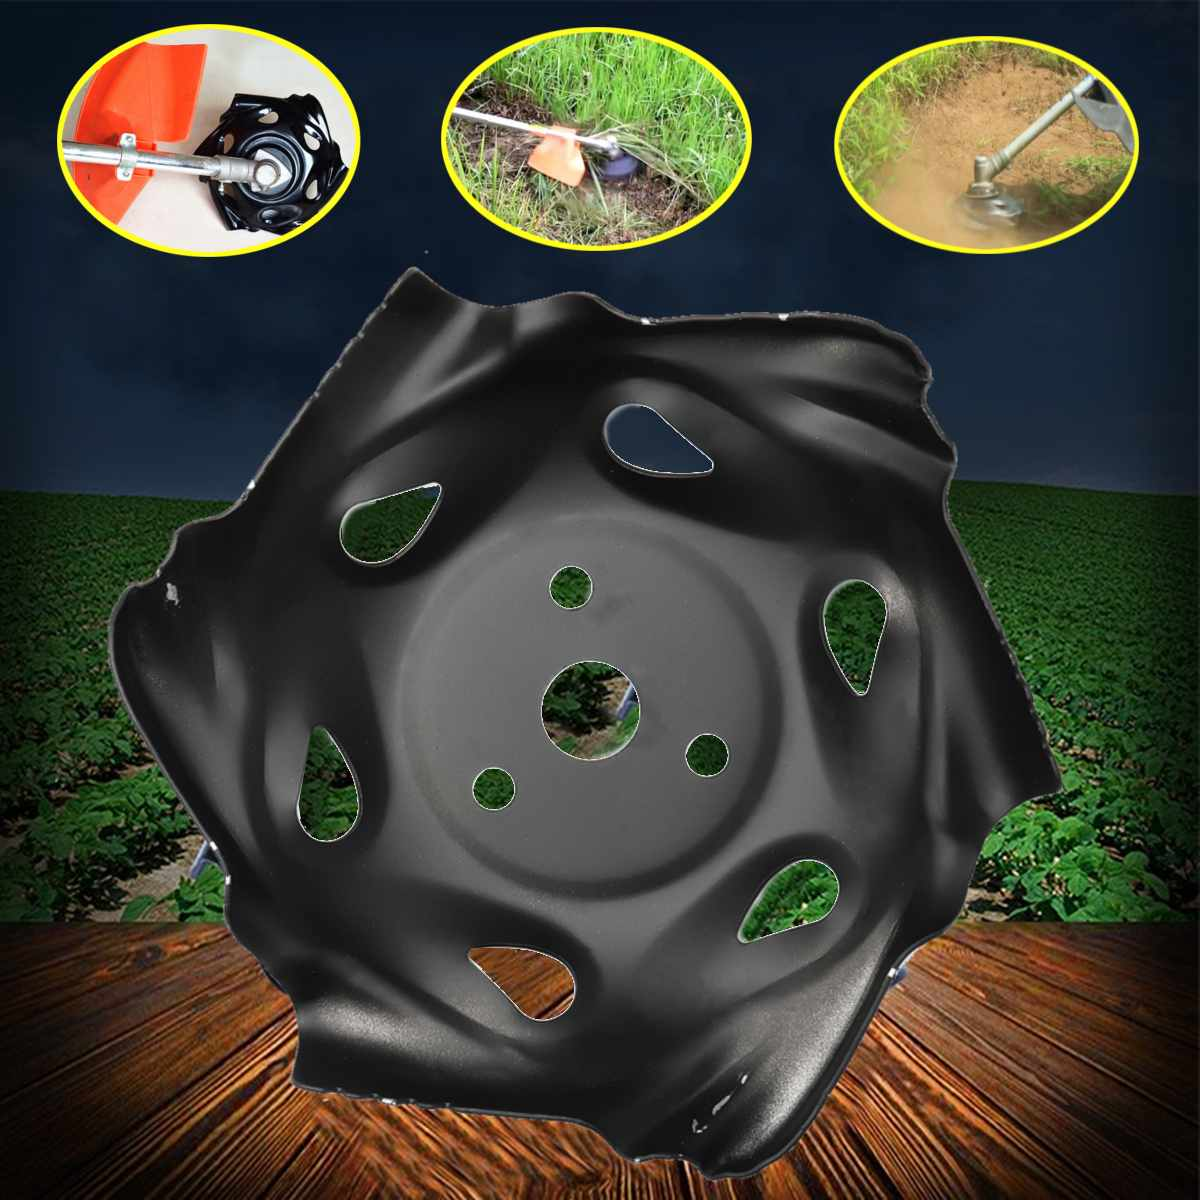 Grass Mowing Lawnmower Weeding Tray Trimmer Head Machine Tray Accessories Garden Power Tool Lawn Mower Parts